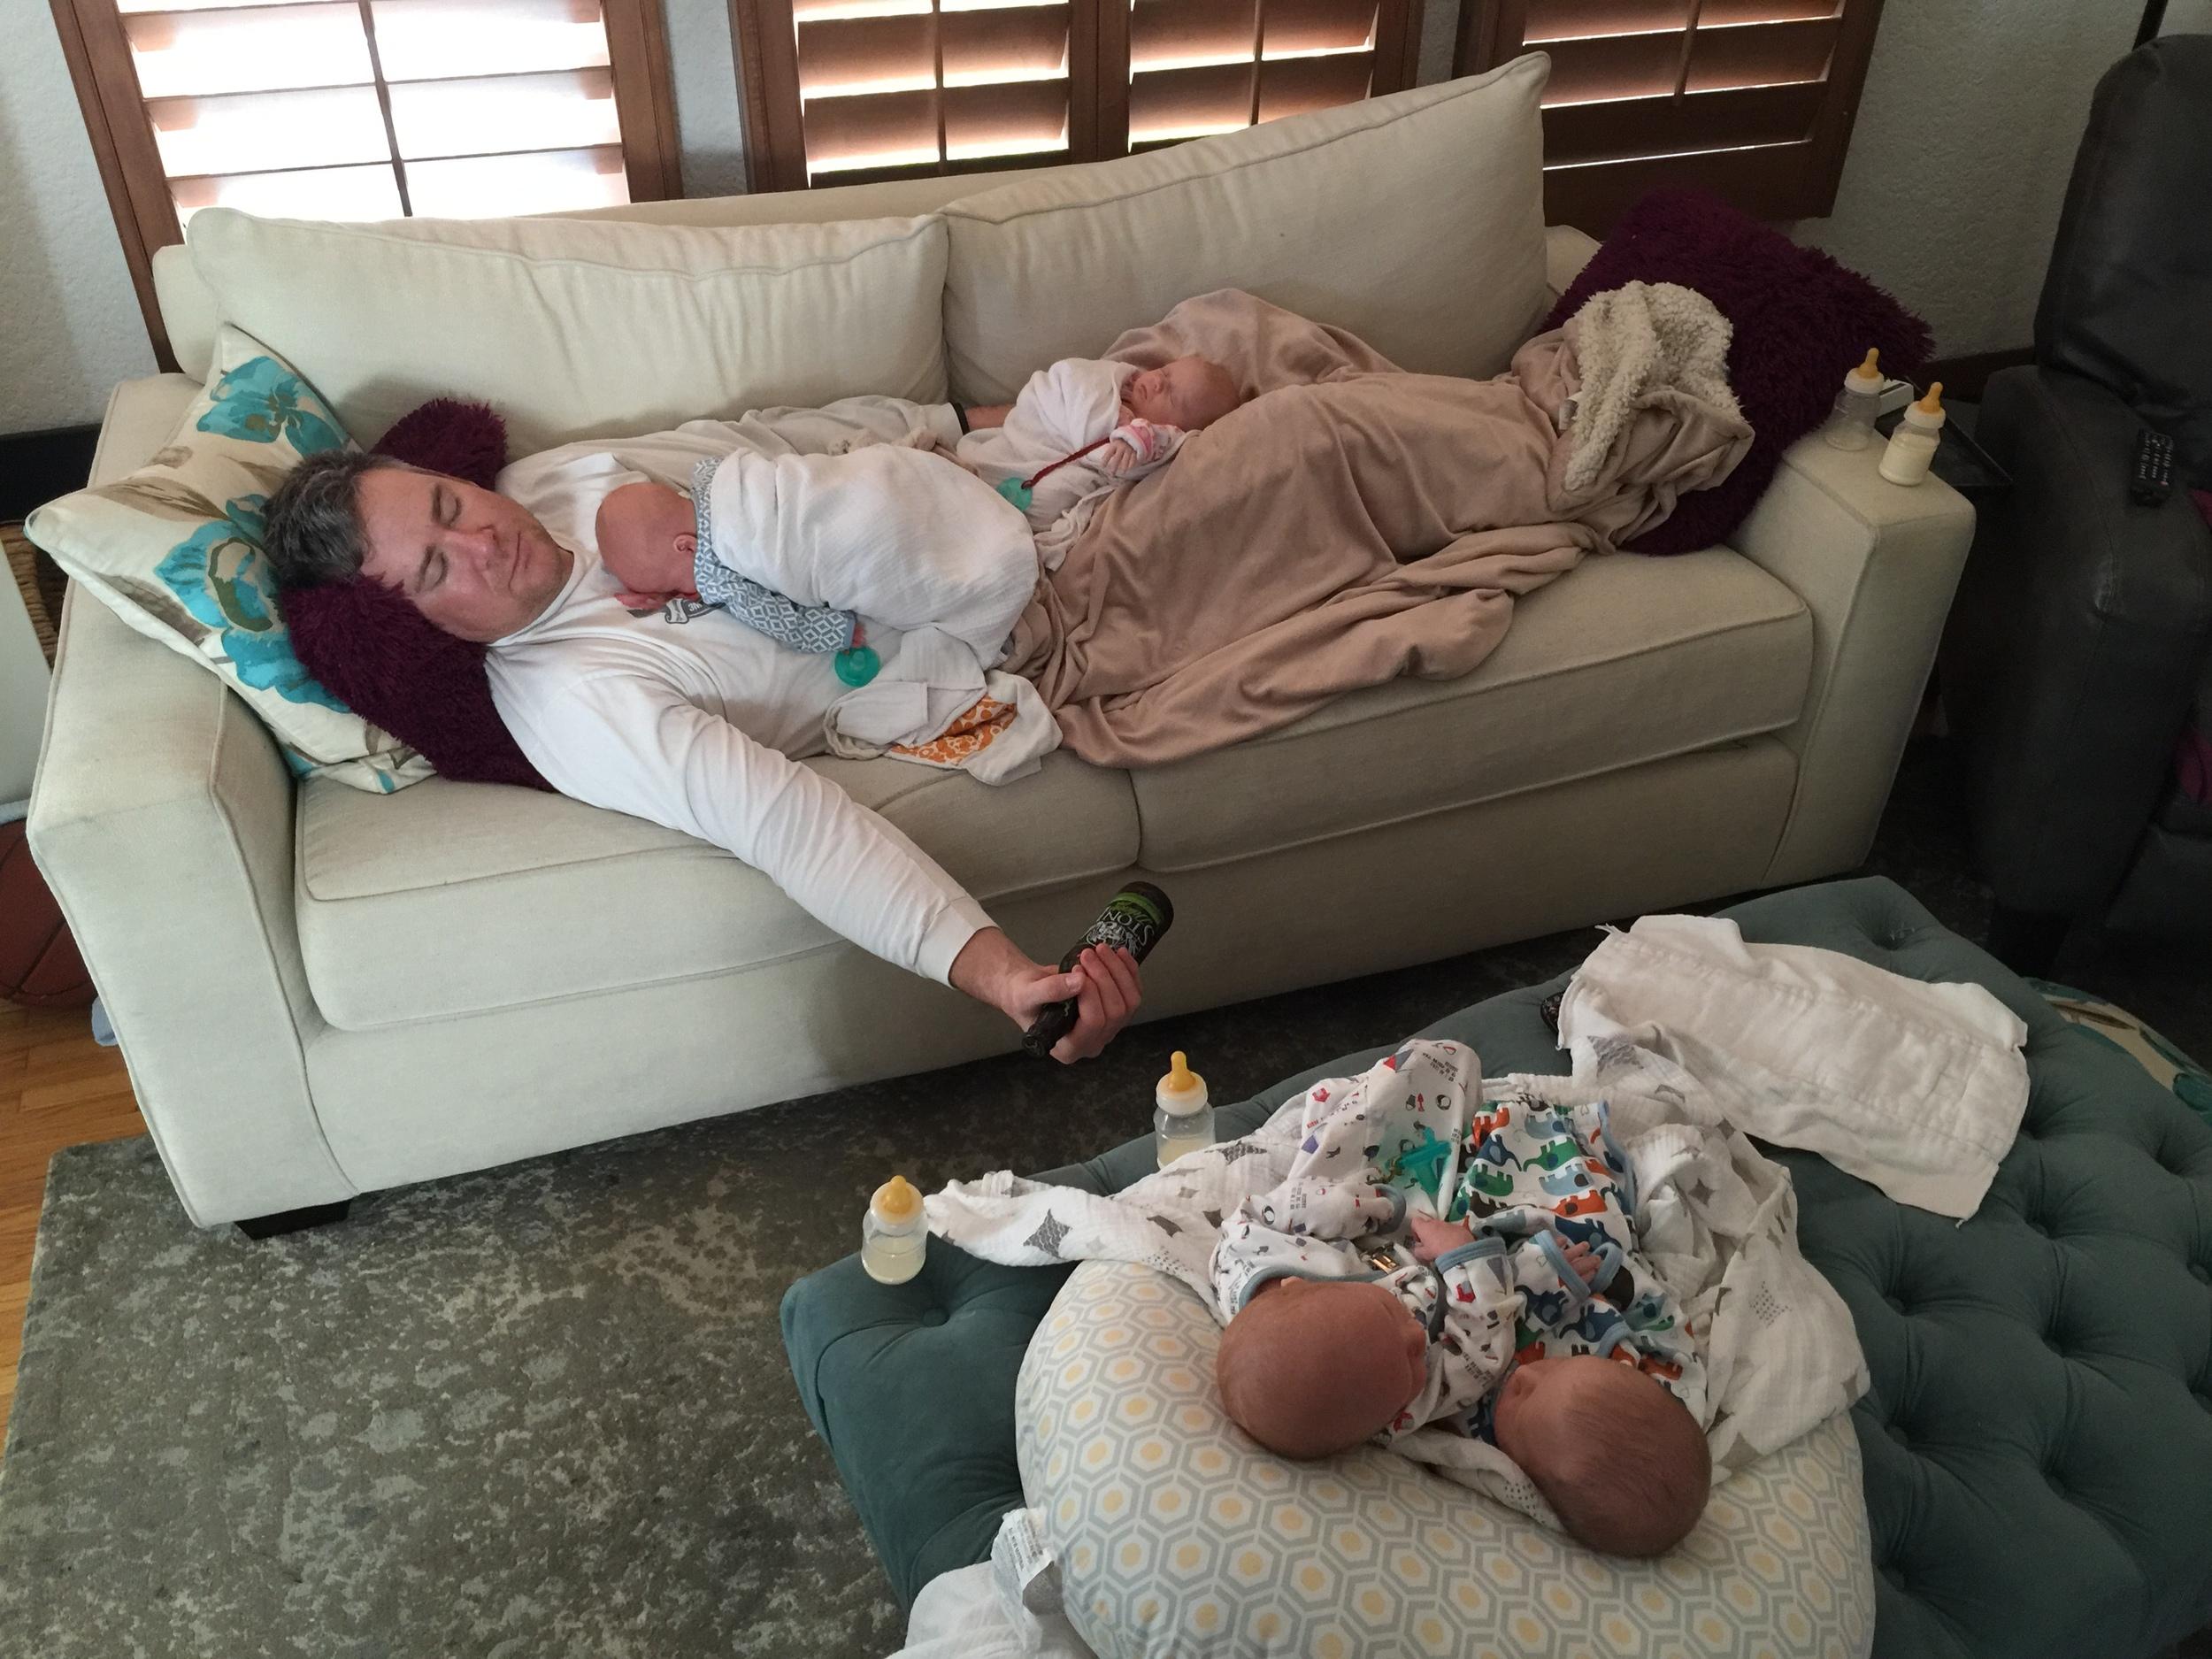 Baby Bash Aftermath